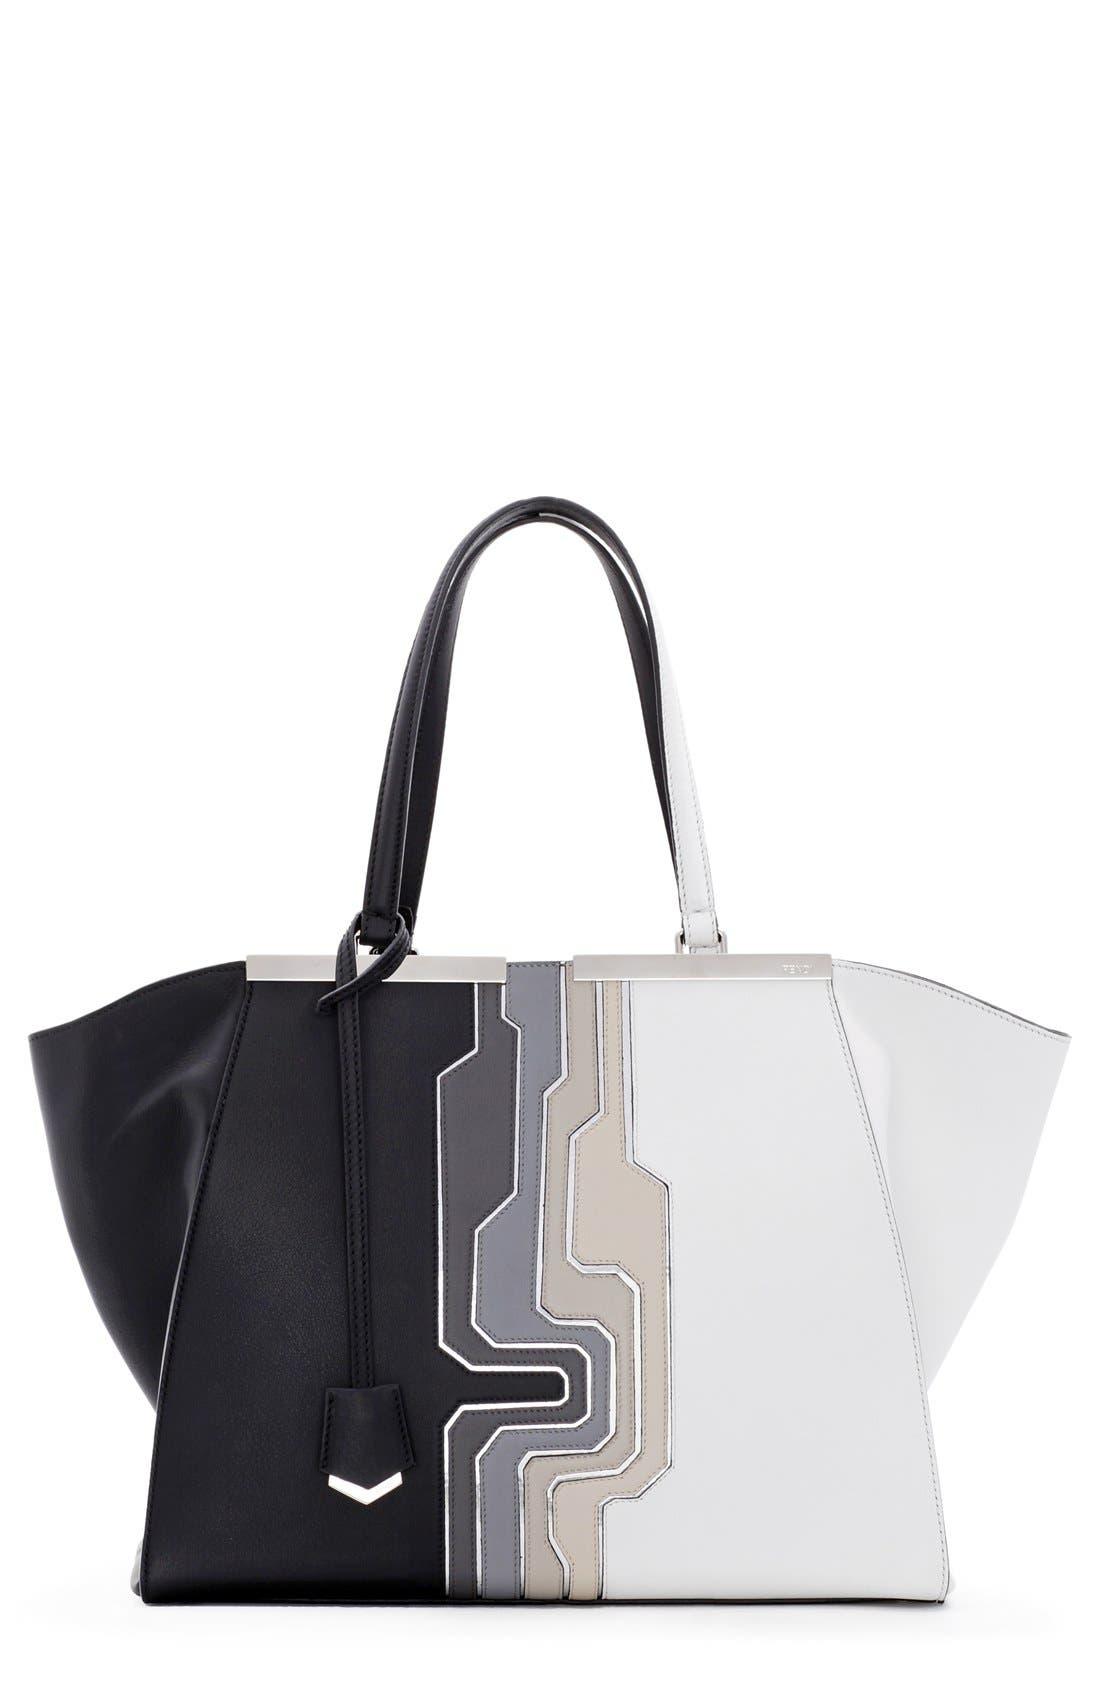 Main Image - Fendi '3Jours - Computer' Leather Shopper